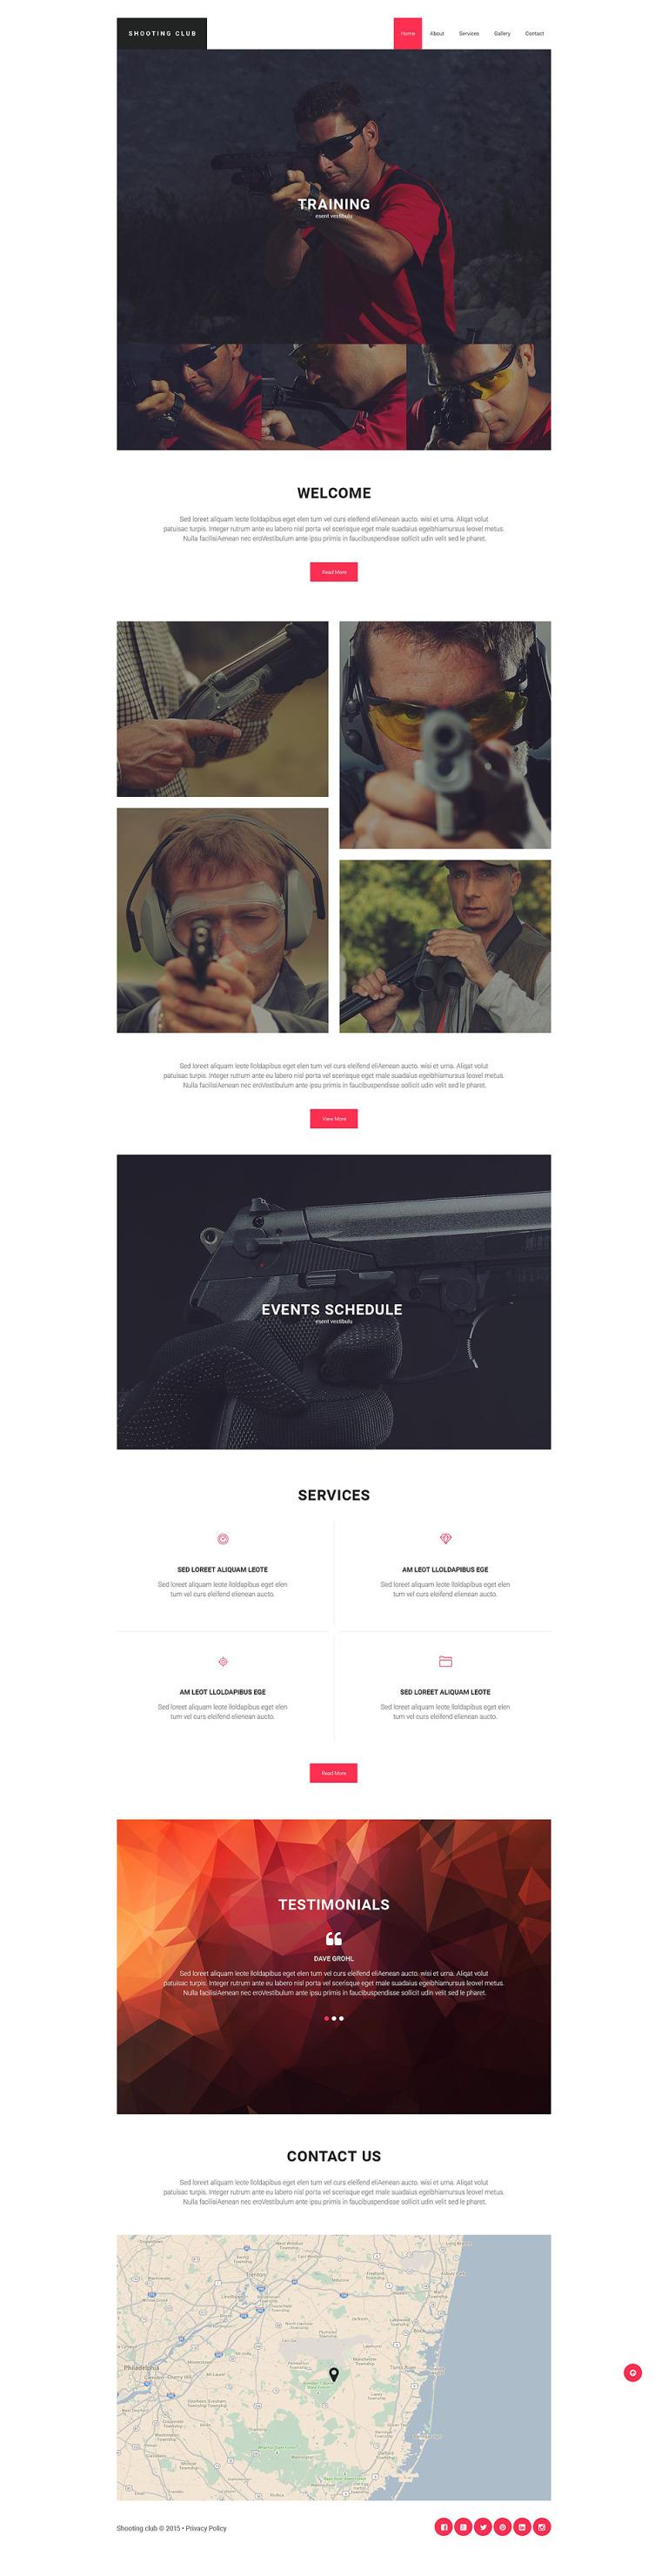 Shooting Responsive Website Template New Screenshots BIG